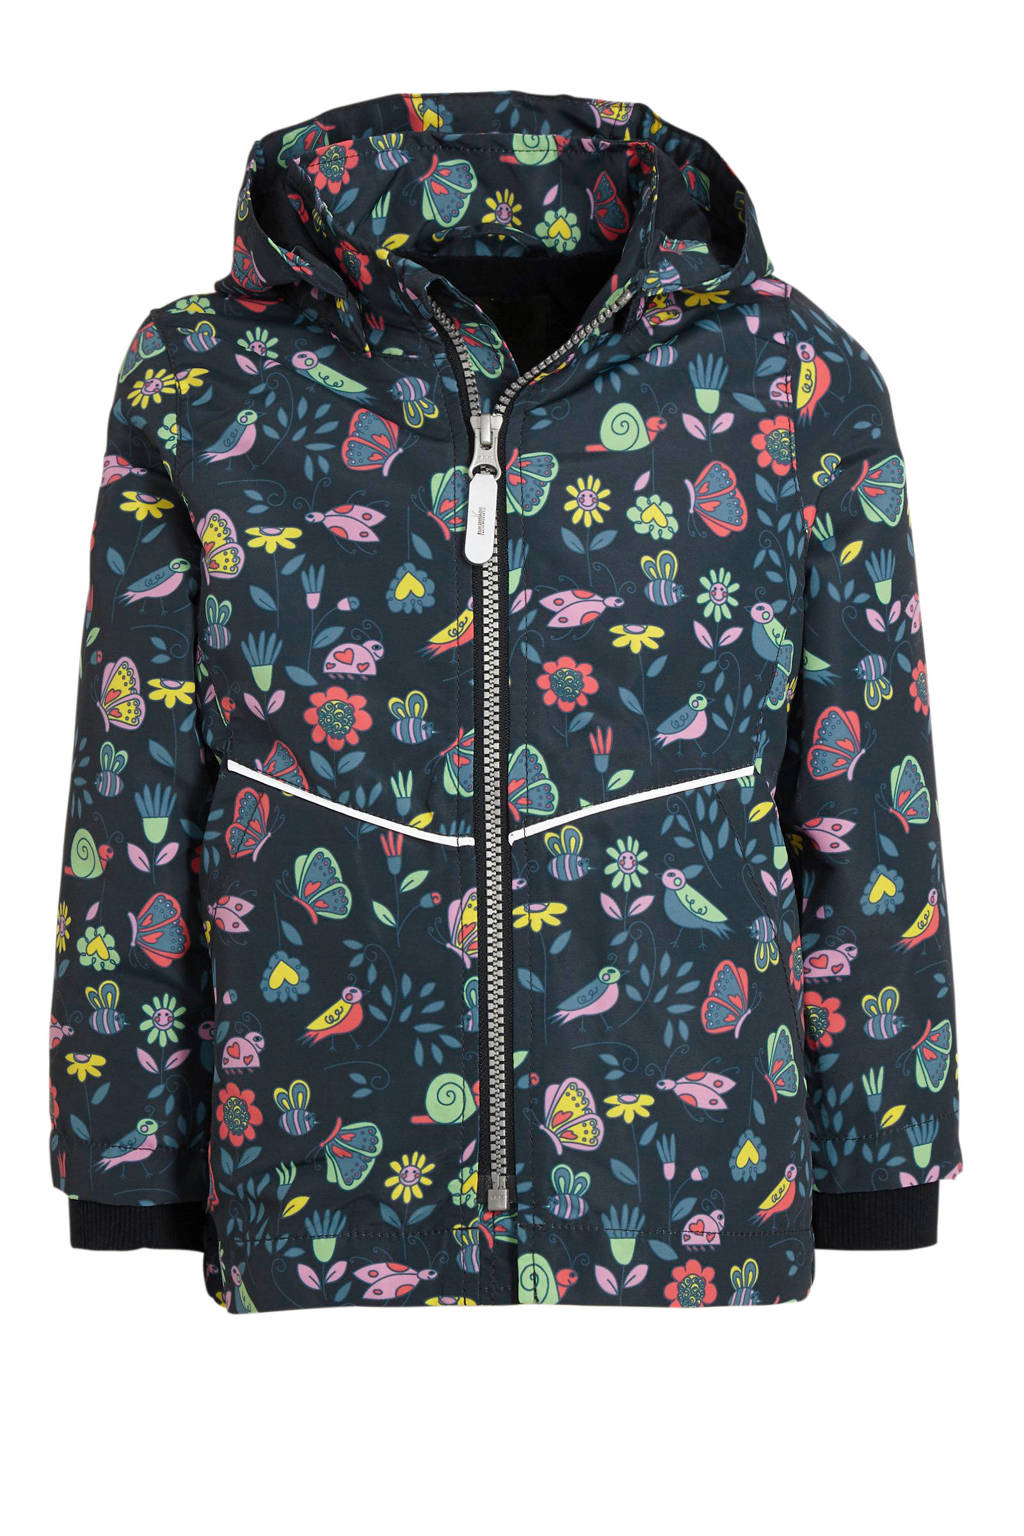 NAME IT MINI zomerjas Maxi met all over print donkerblauw/paars/groen, Donkerblauw/paars/groen